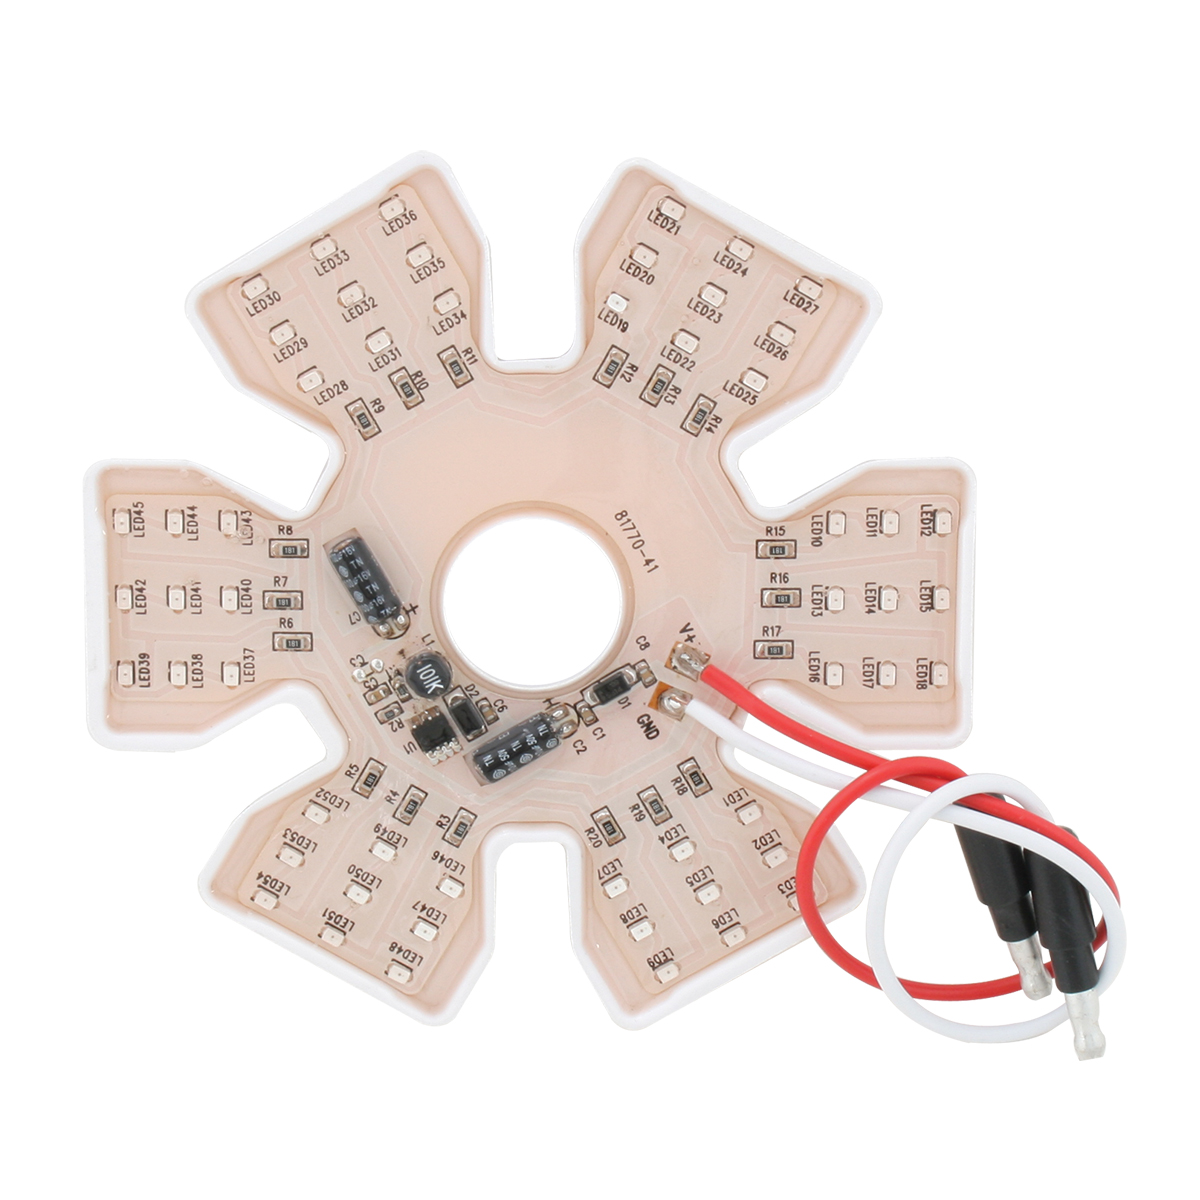 Unlit Ultra Thin Hex Air Cleaner LED Light